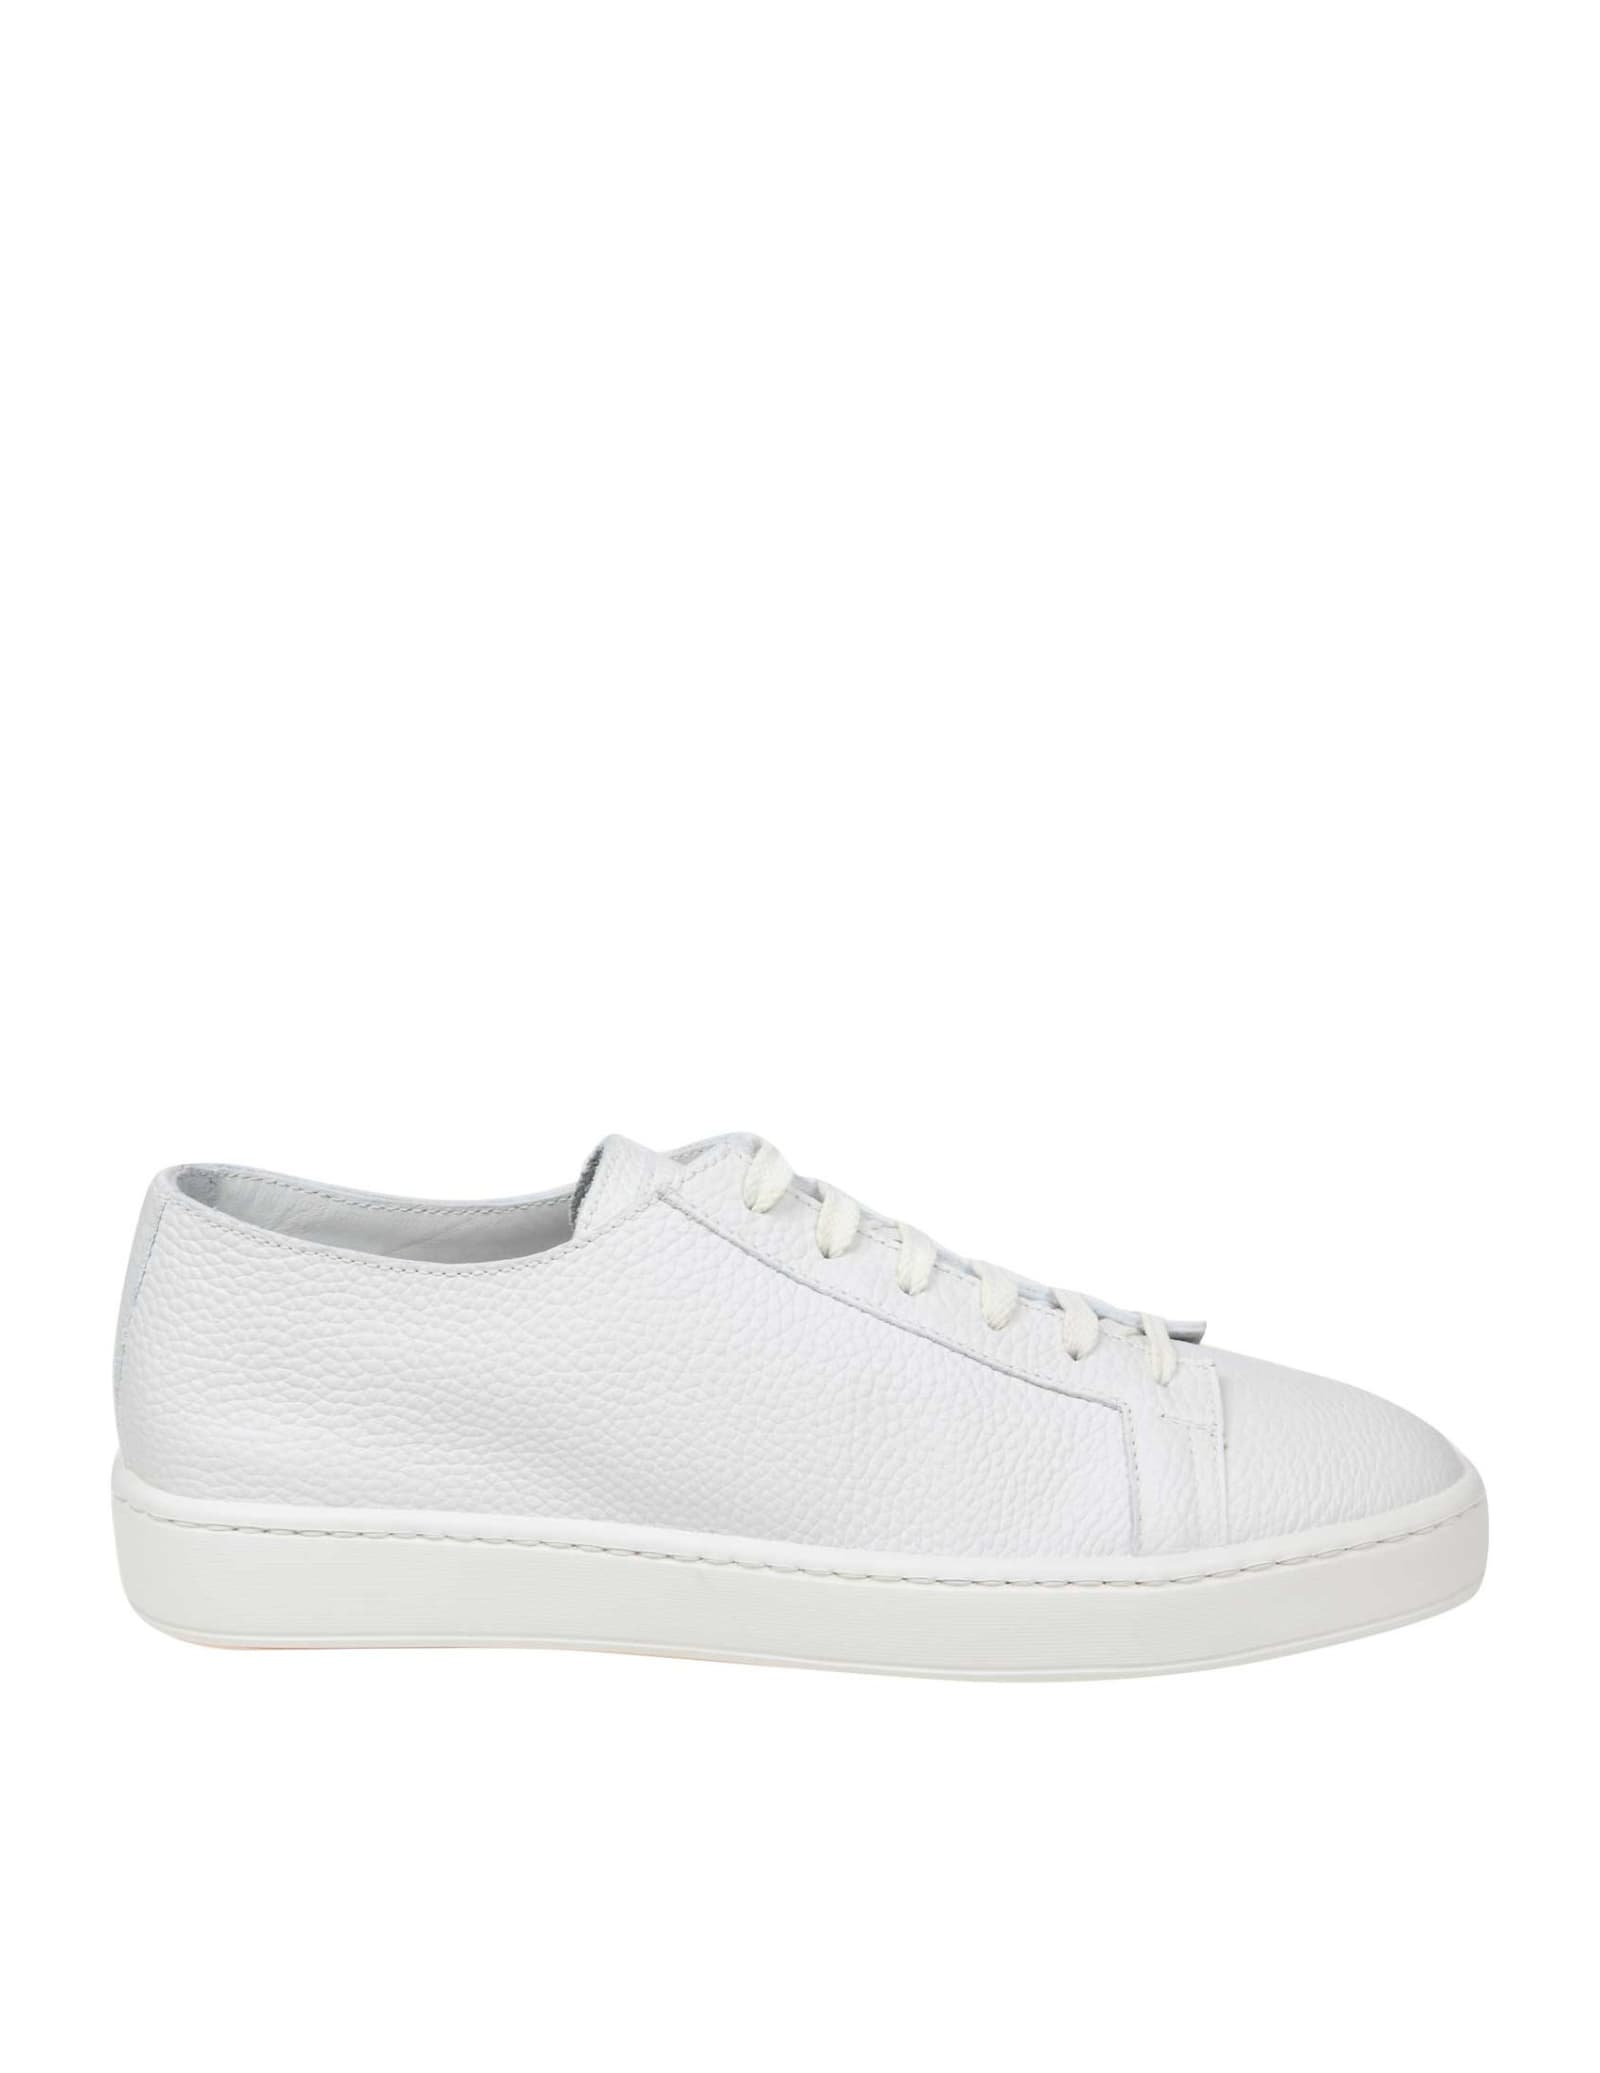 Sneakers Santoni With Nappa White Color